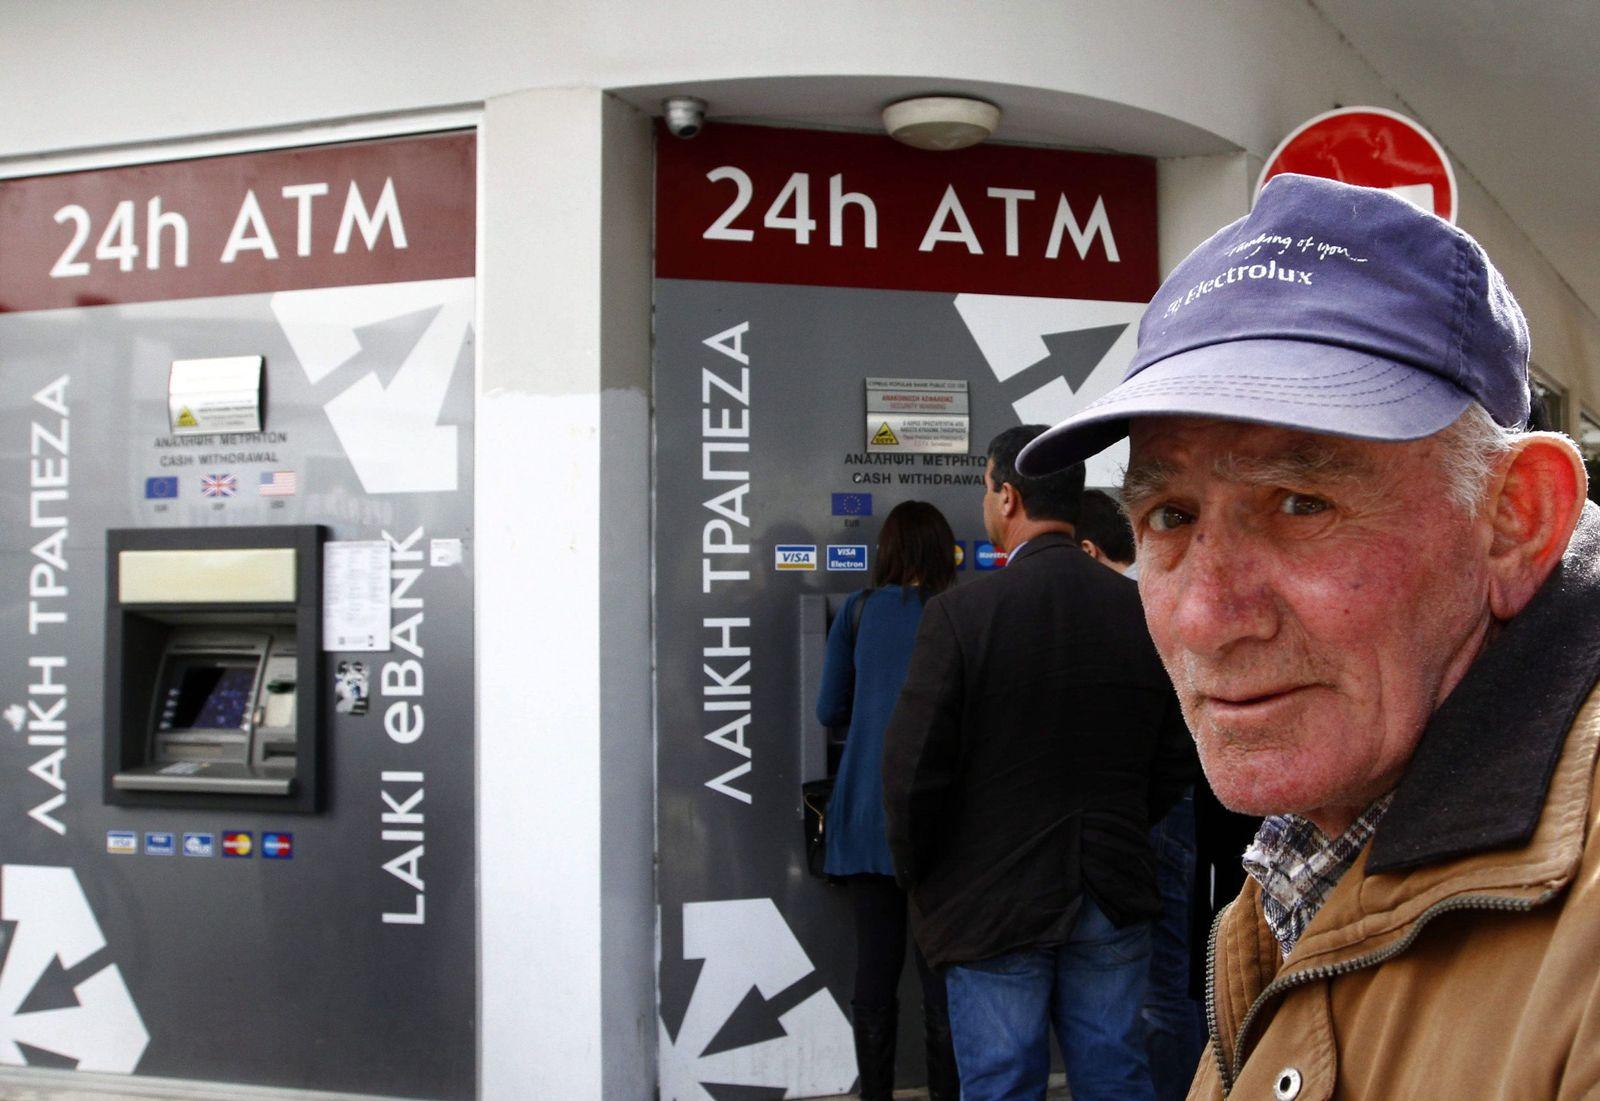 Zypern / Finanzkrise / Bank-Automat